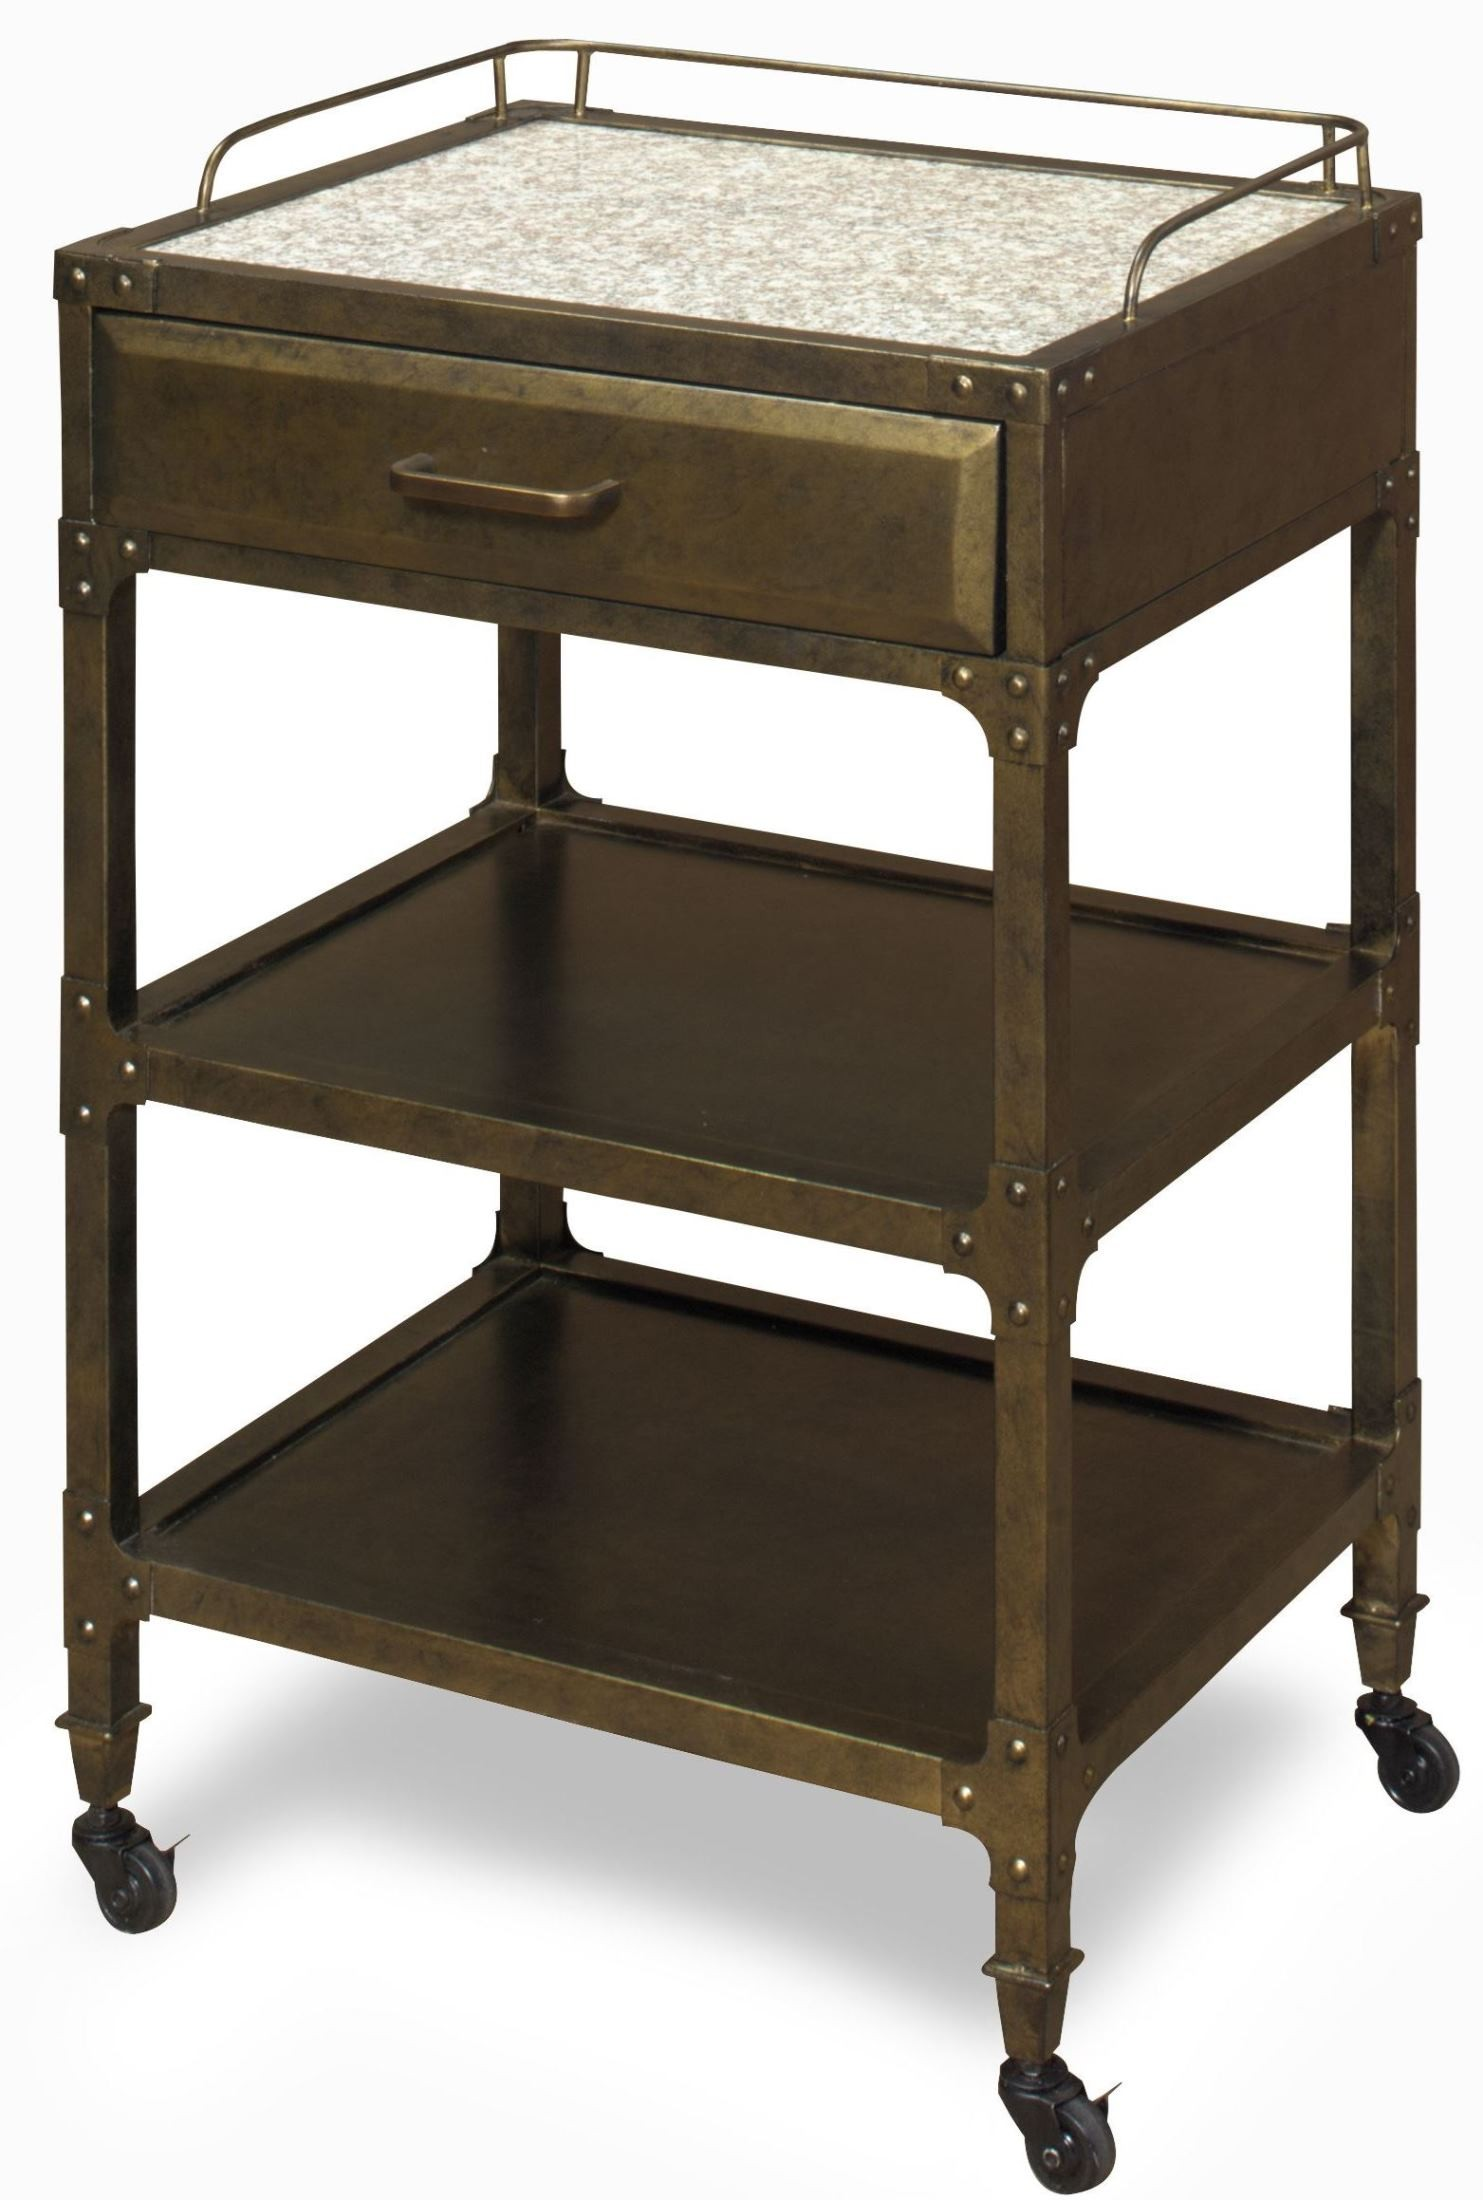 max metal utility table from progressive furniture coleman furniture. Black Bedroom Furniture Sets. Home Design Ideas